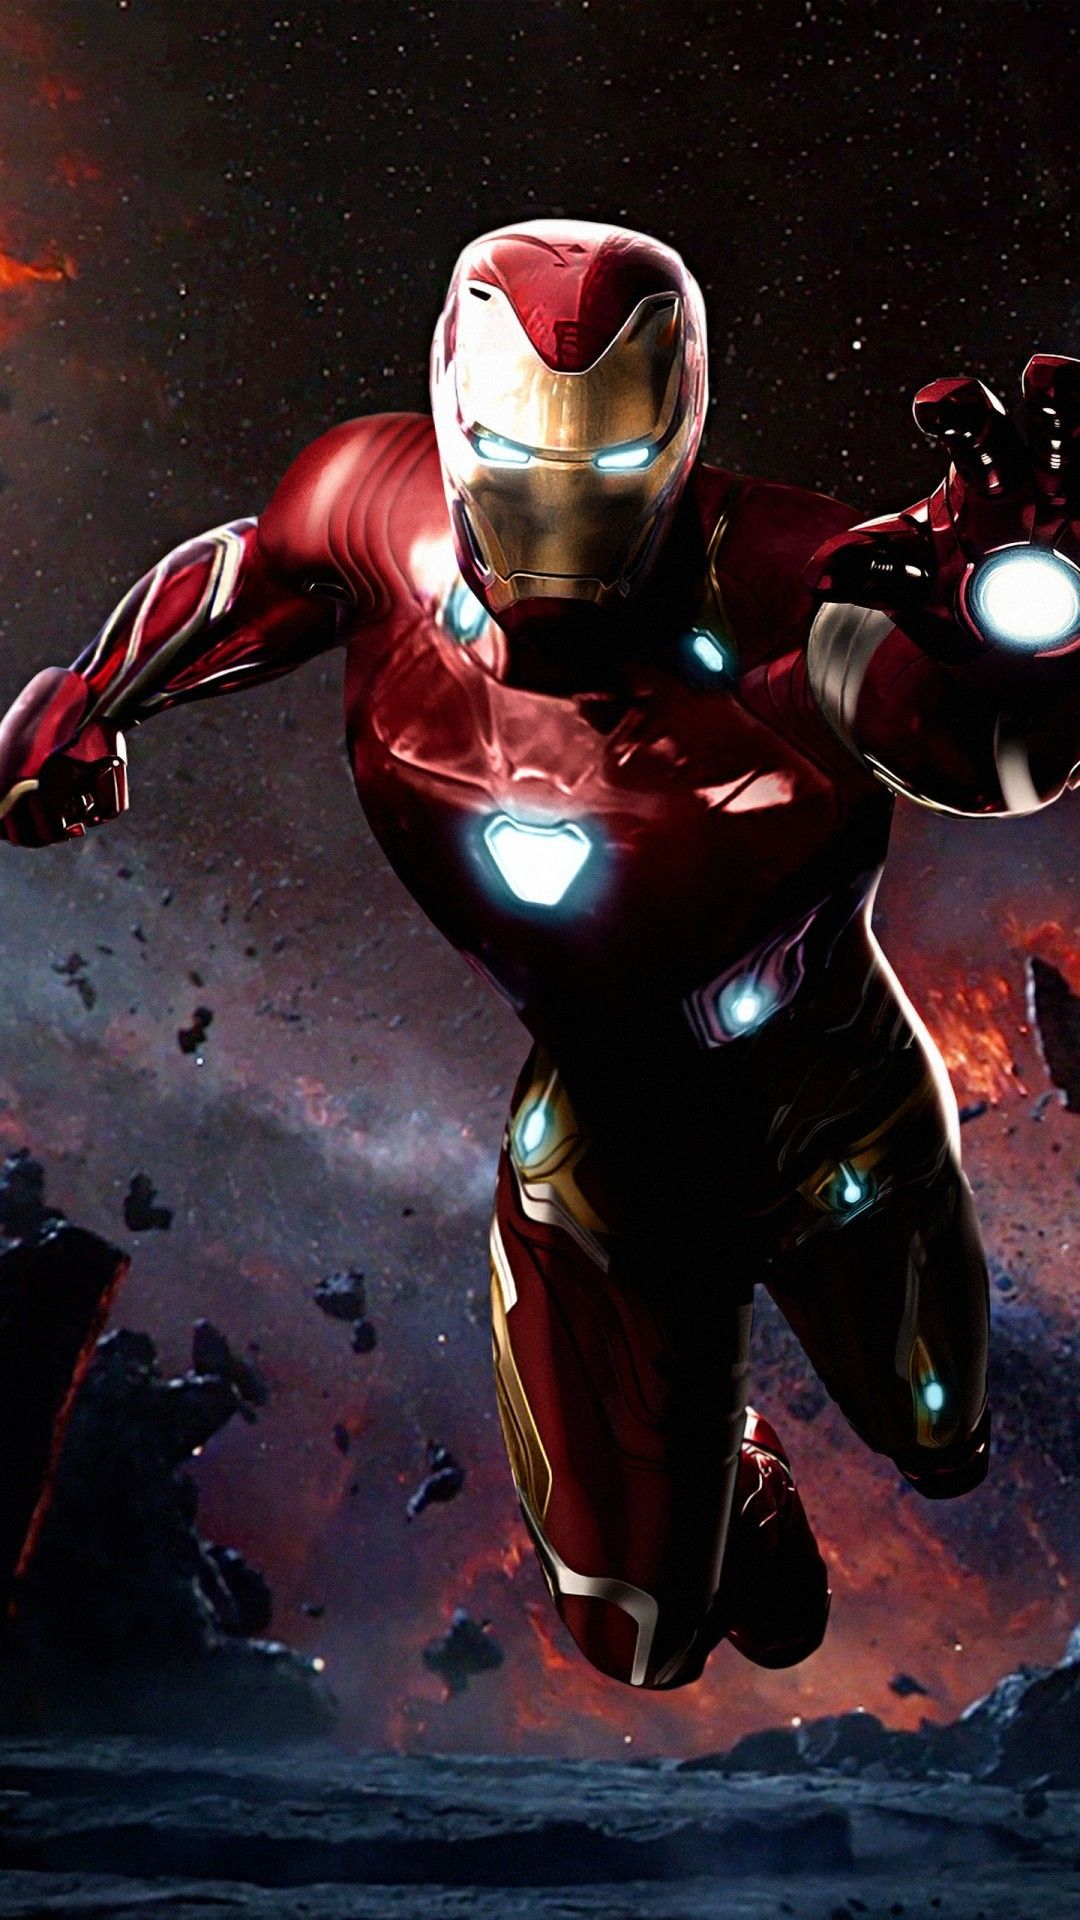 Free Iron Man Avengers Infinity War phone wallpaper by